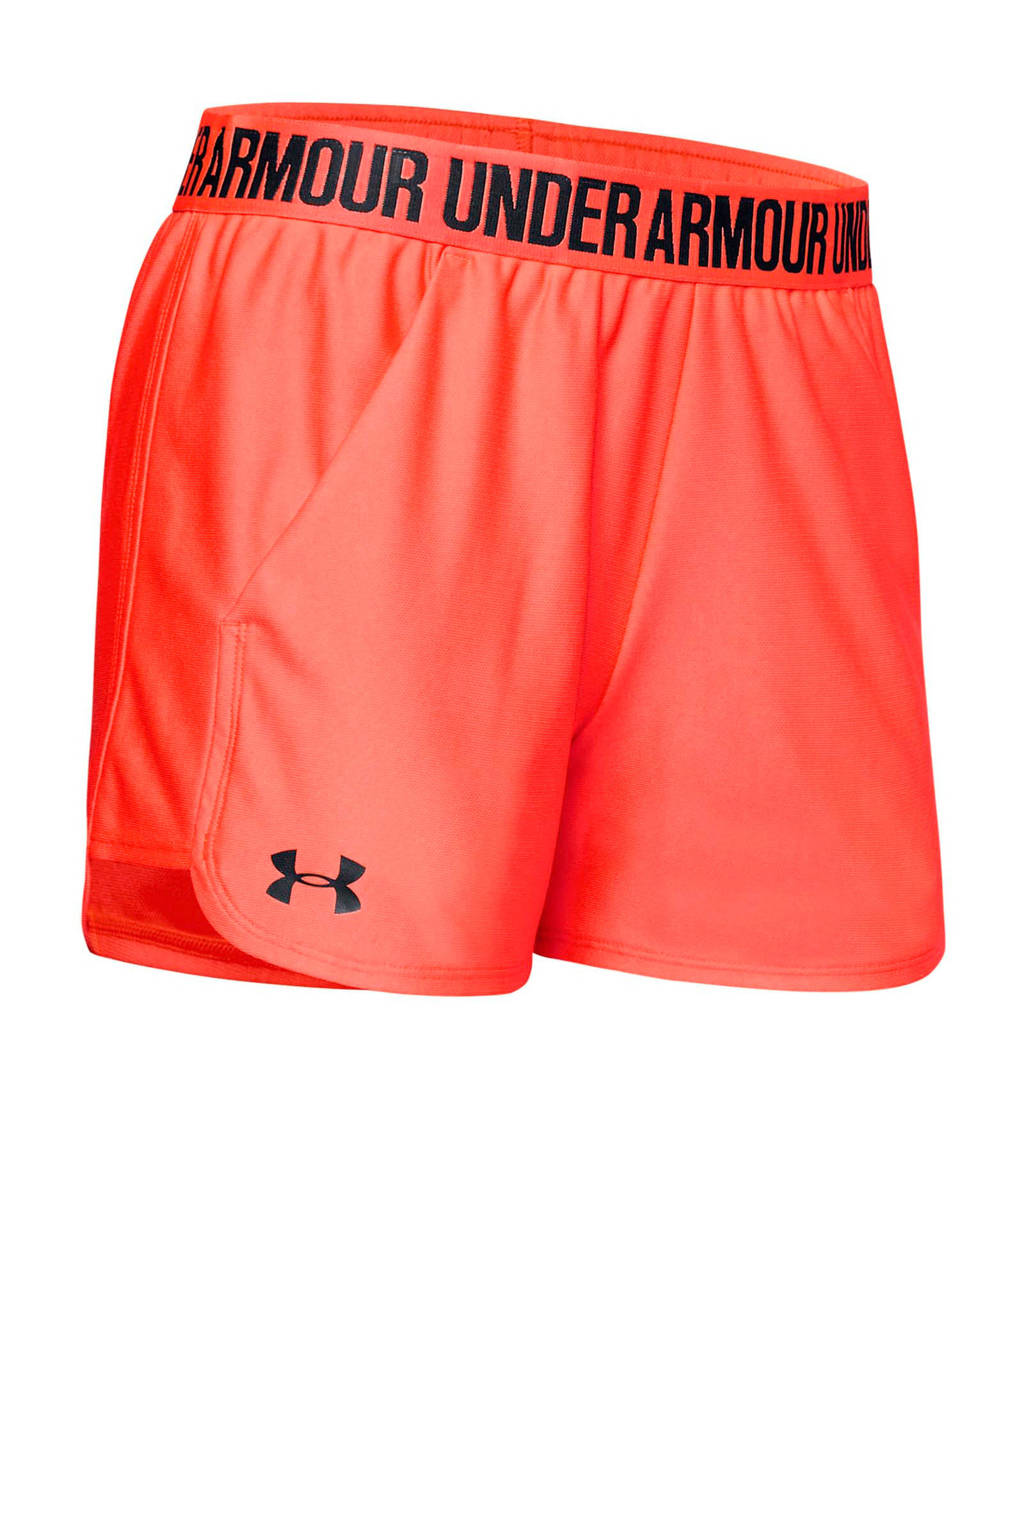 Under Armour sportshort oranje, Oranje